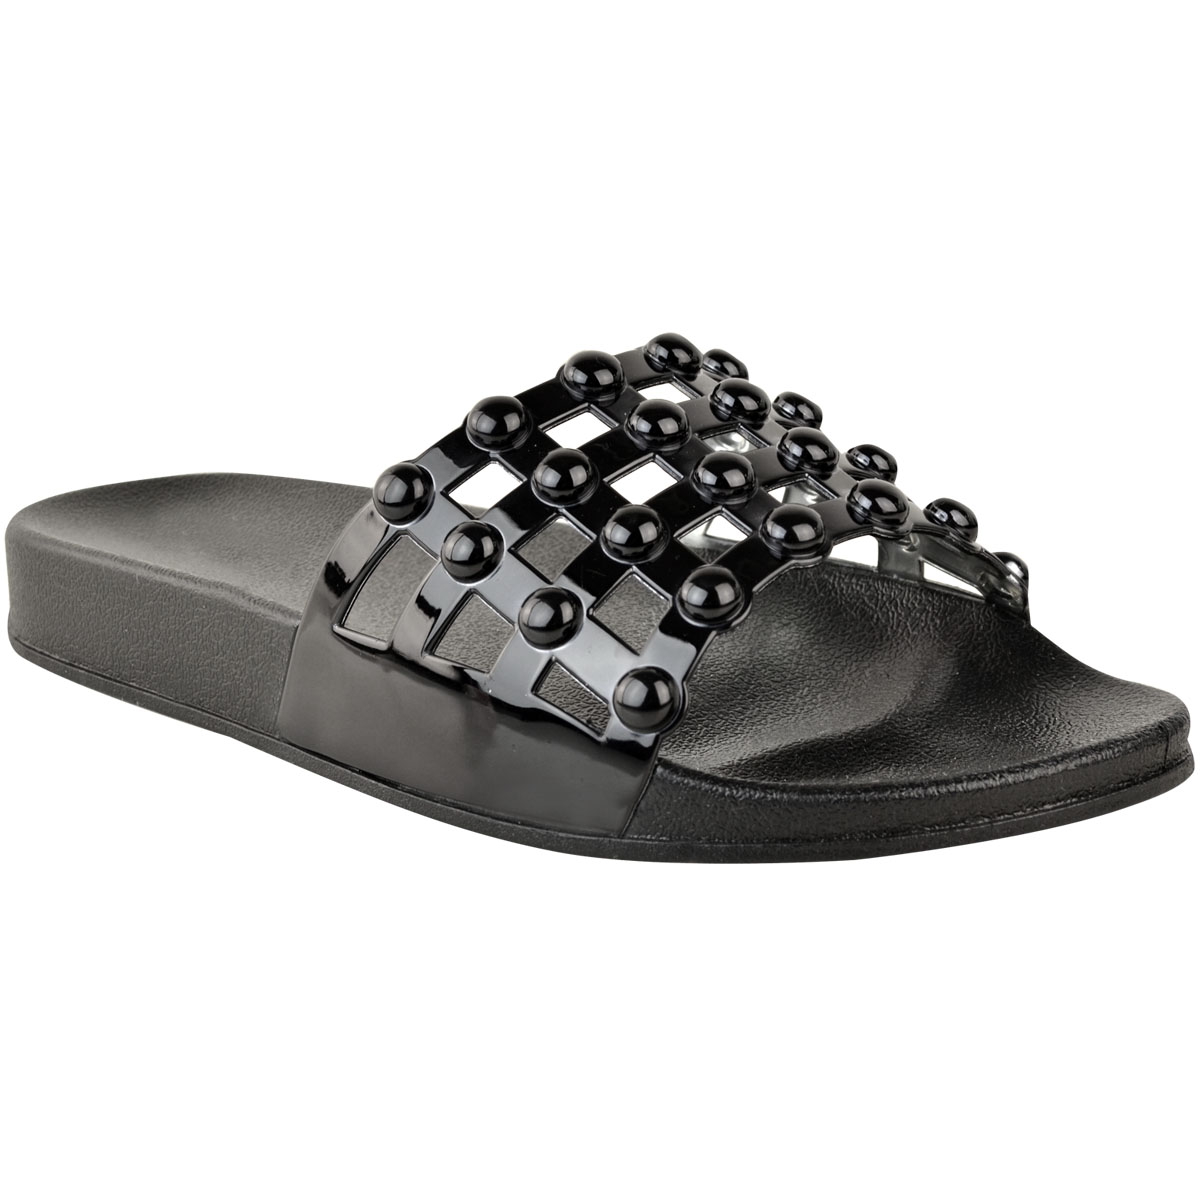 9013adad4023 Womens Flat Summer Sandals Sliders Studded Slip On Comfort Open Toe ...